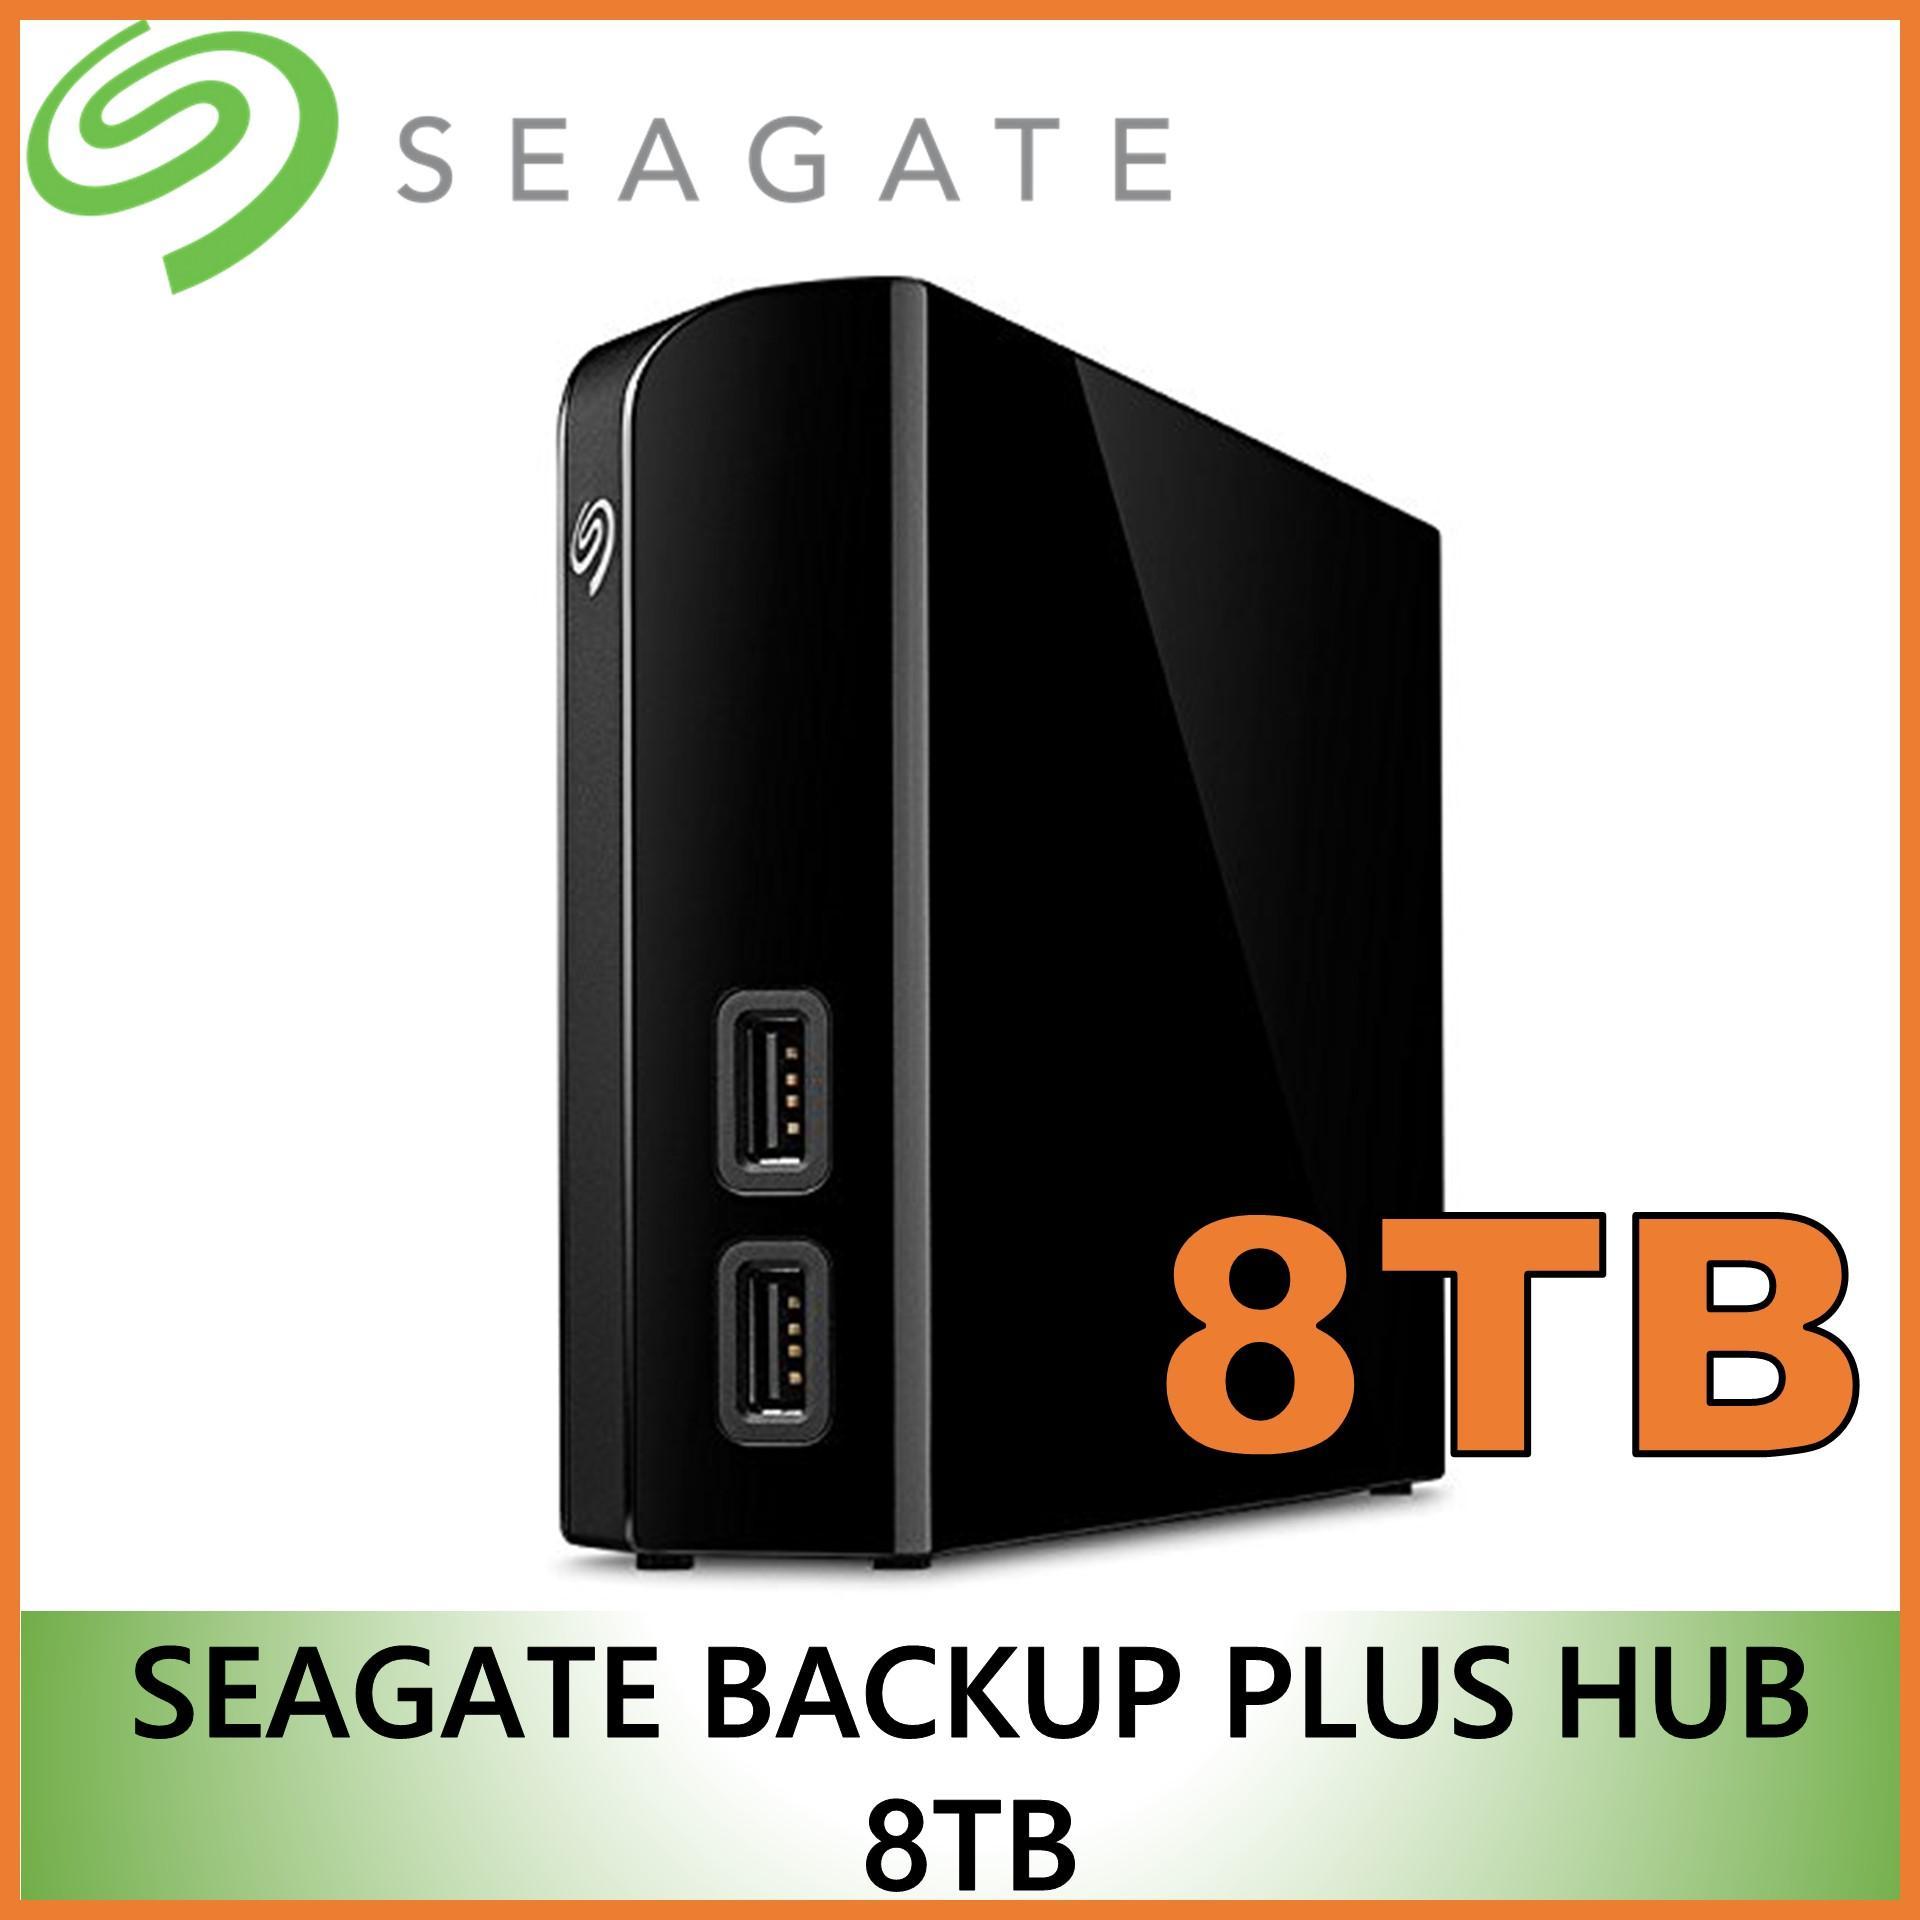 Buy Leegoal Black 35 Inch 144mb Usb 20 Portable External Floppy Seagate Backup Plus Desktop Hub 8tb Hdd 3 Year Warranty New Original Hard Drive Storage Singapore